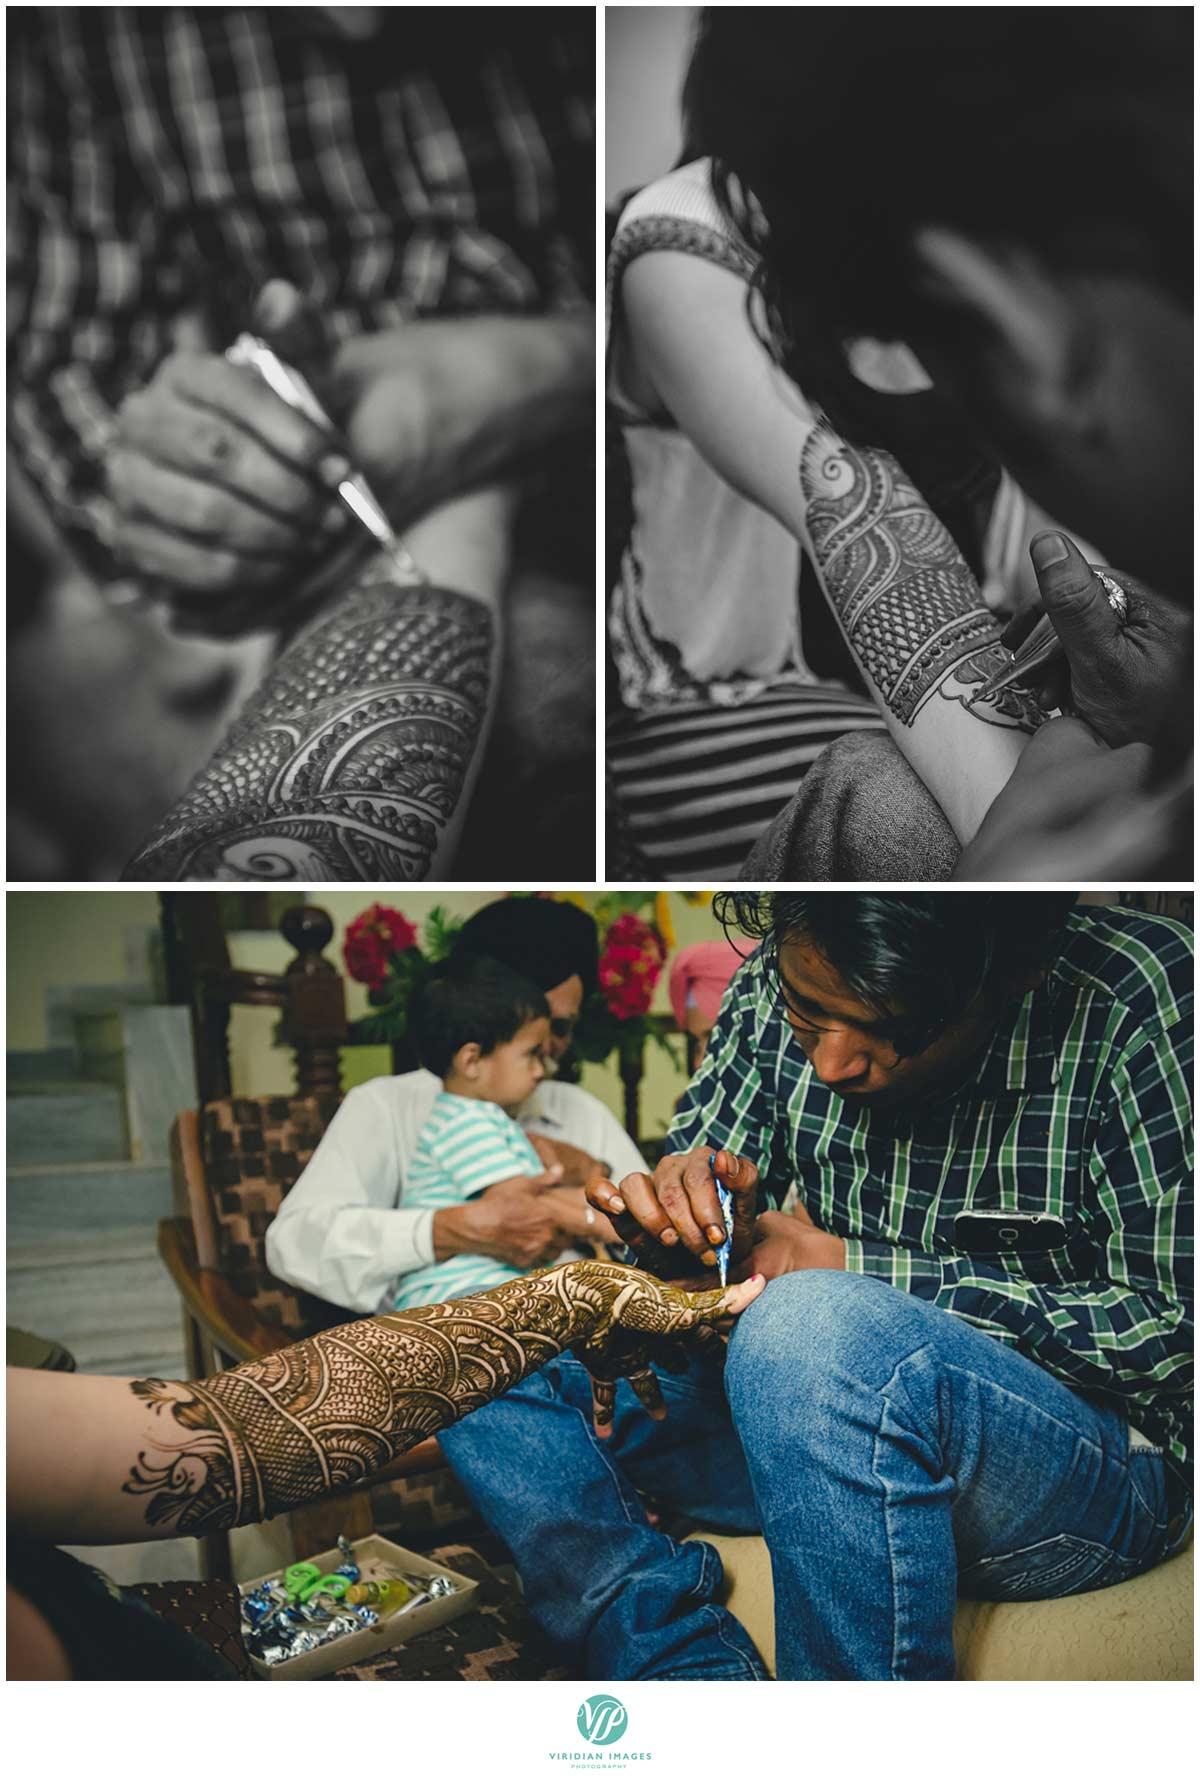 India_Wedding_Chandigarh_Mehndi_Viridian_Images_Photography_photo_2